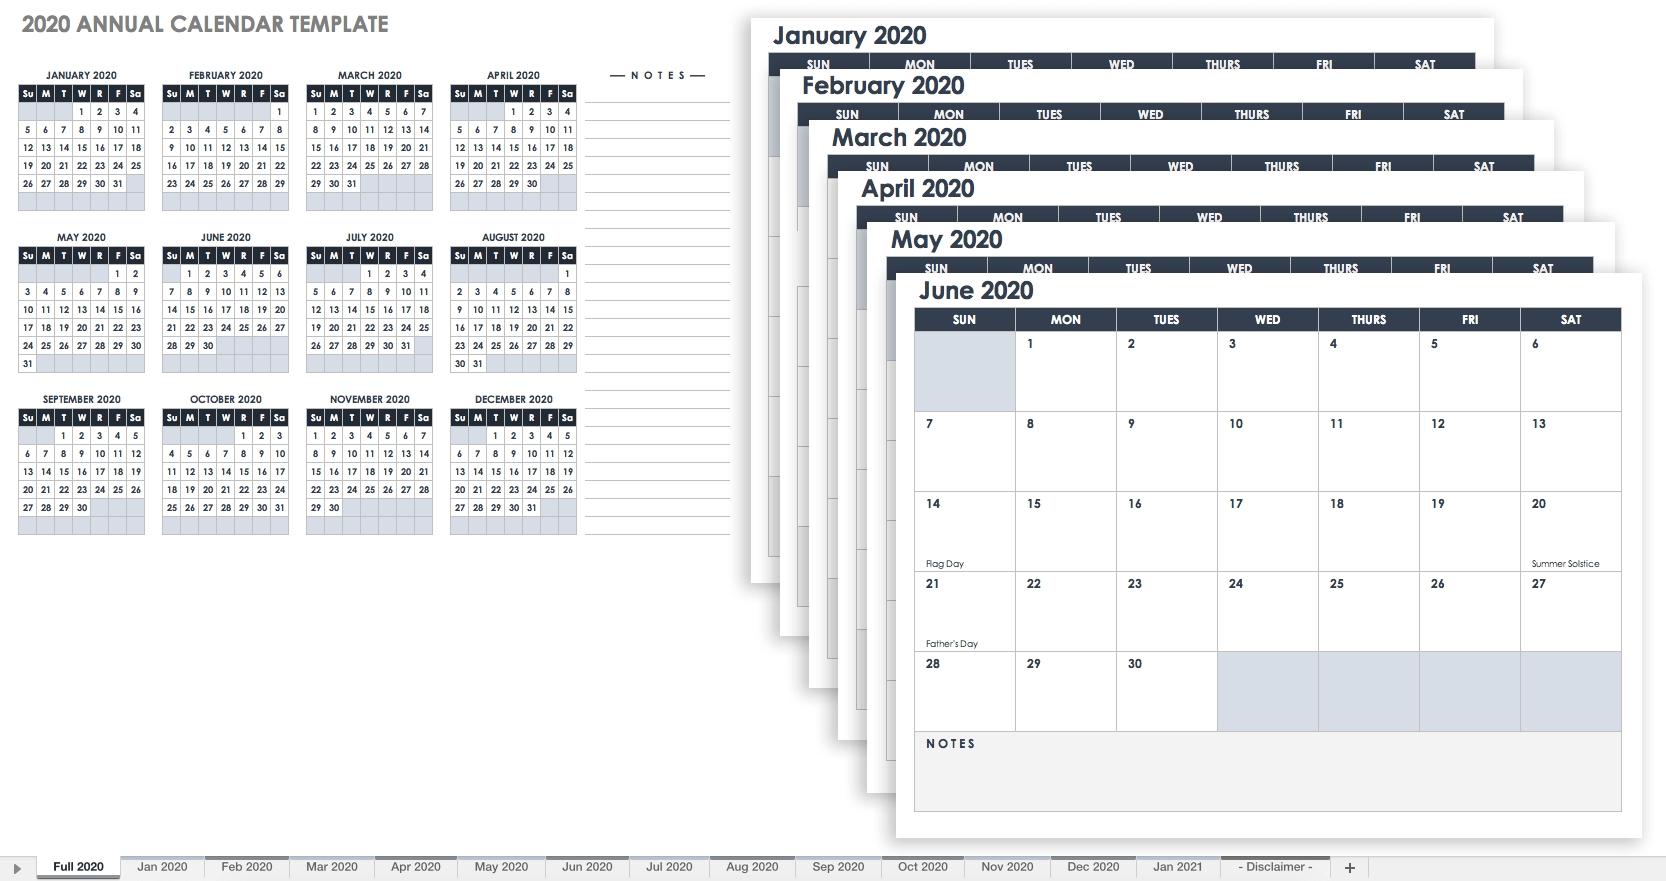 Free, Printable Excel Calendar Templates For 2019 & On | Smartsheet regarding 2020 Calendars To Fill In